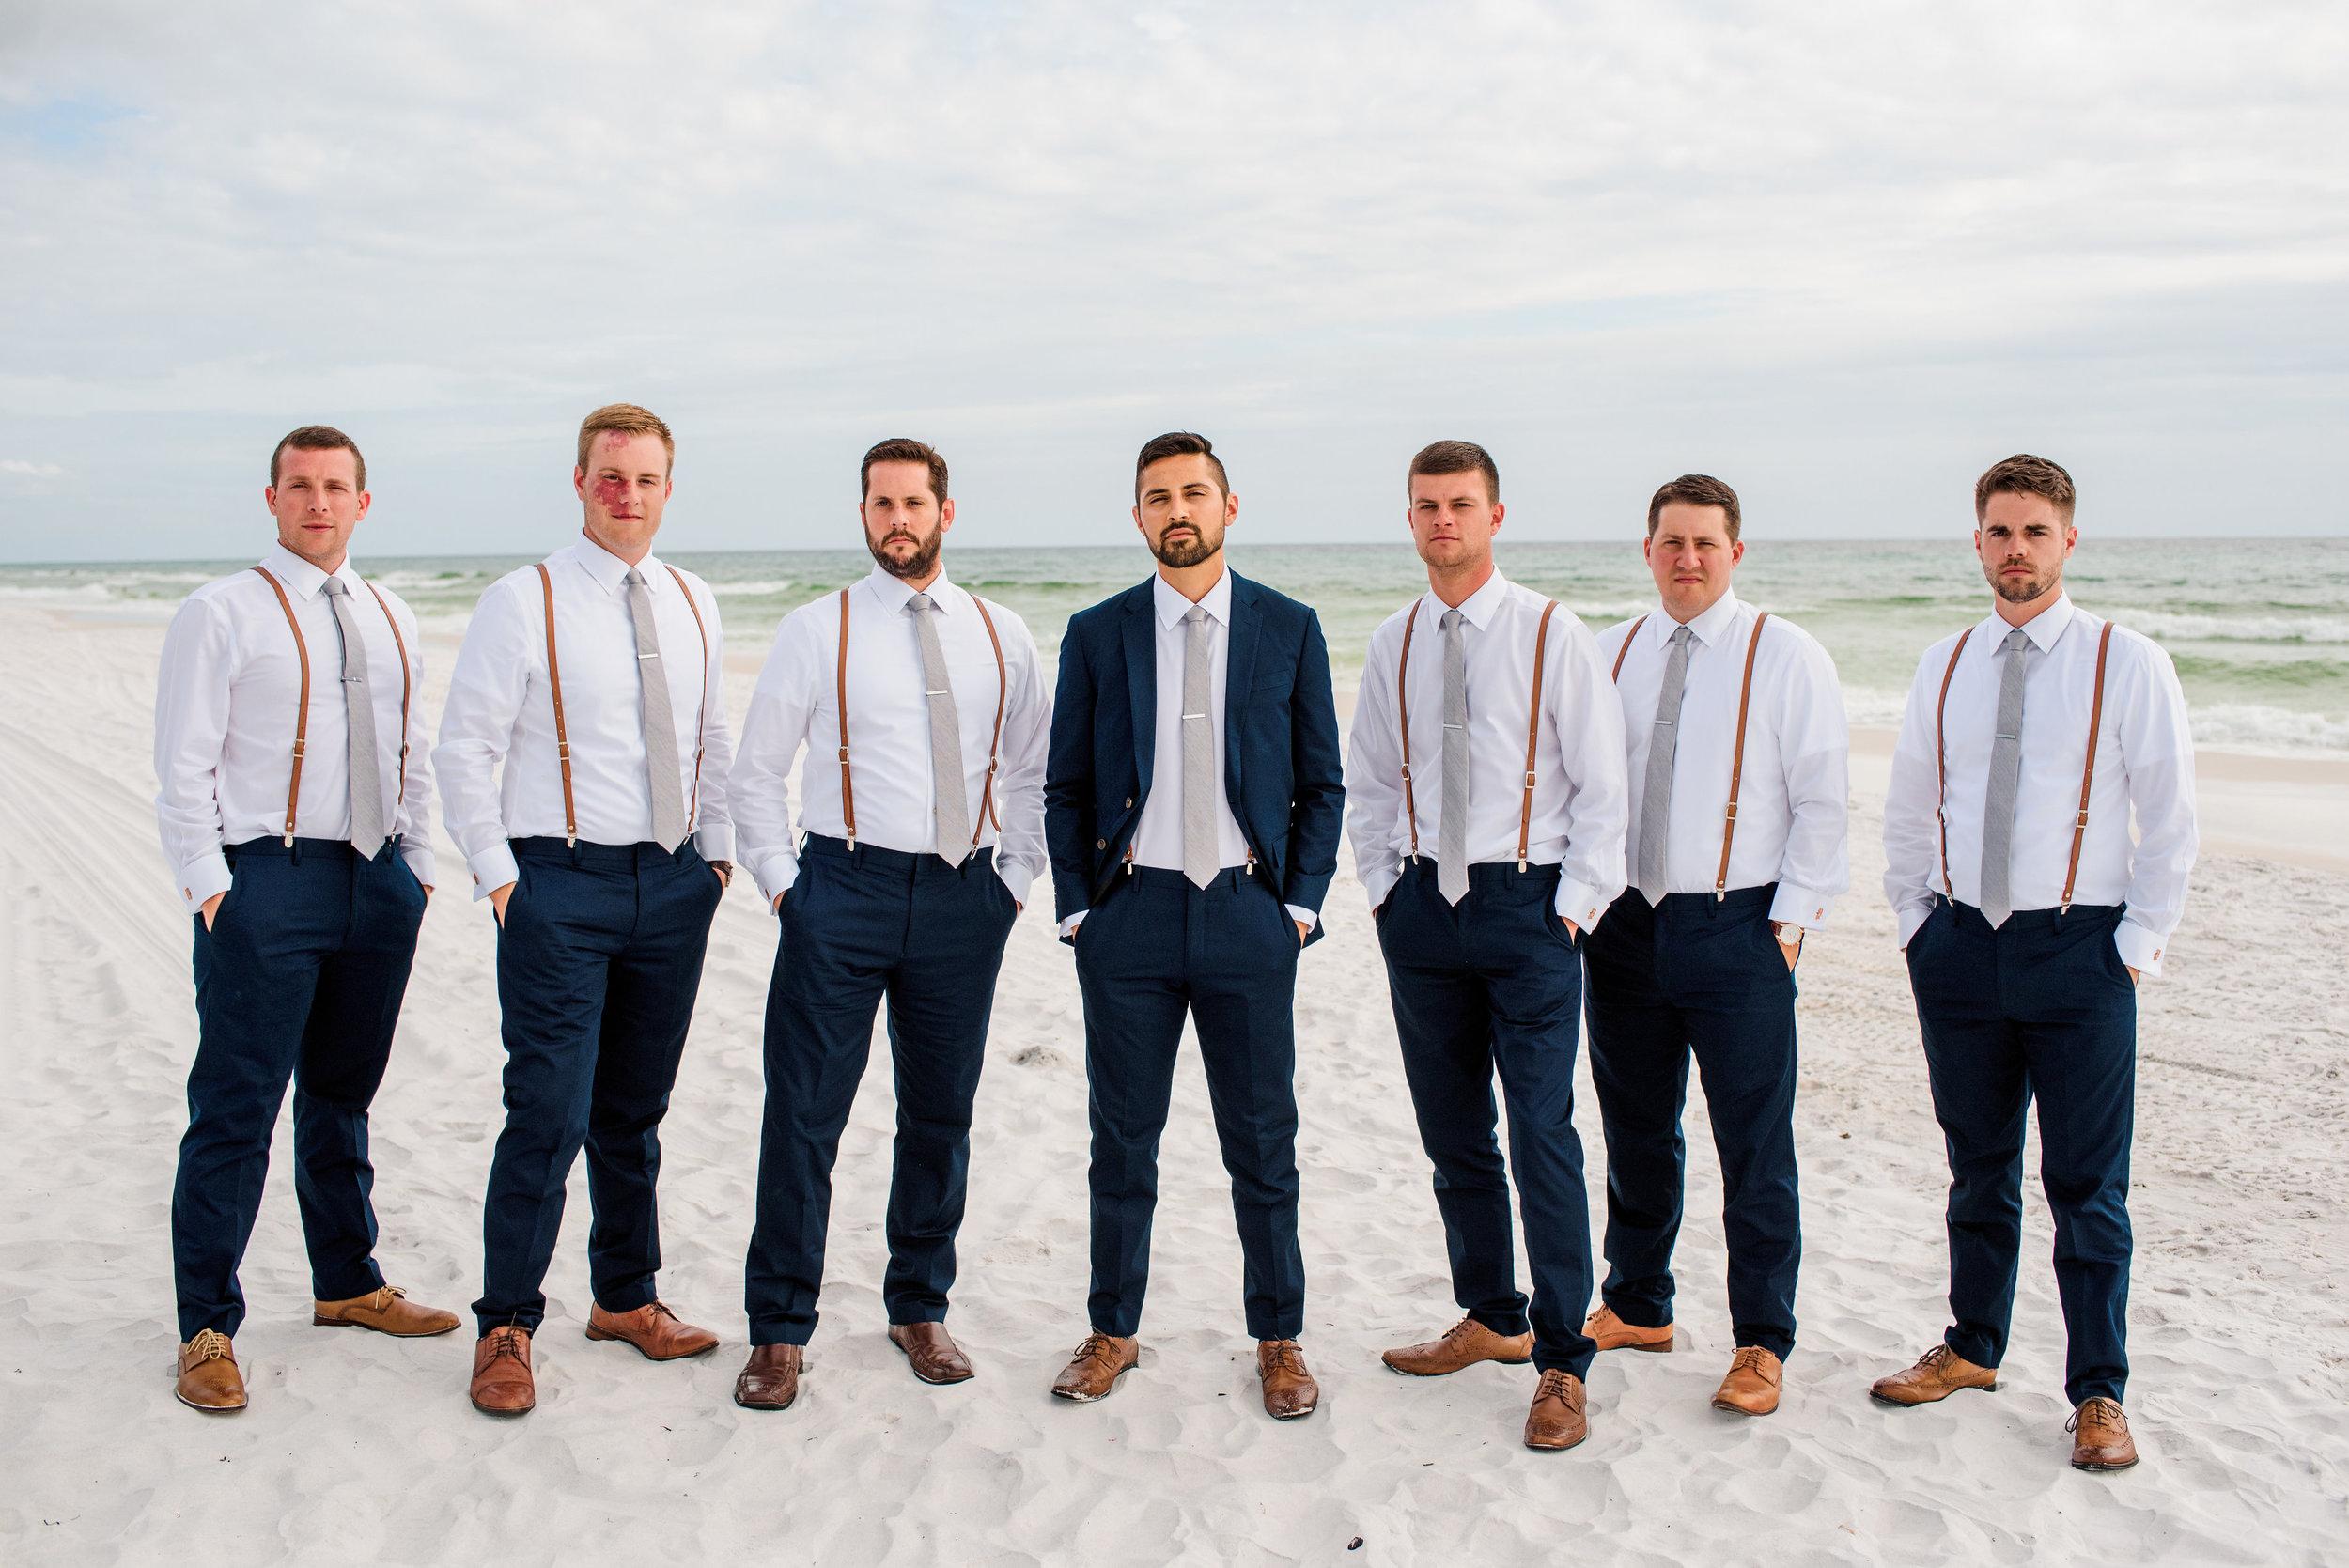 Santa Rosa Beach Wedding17.jpg